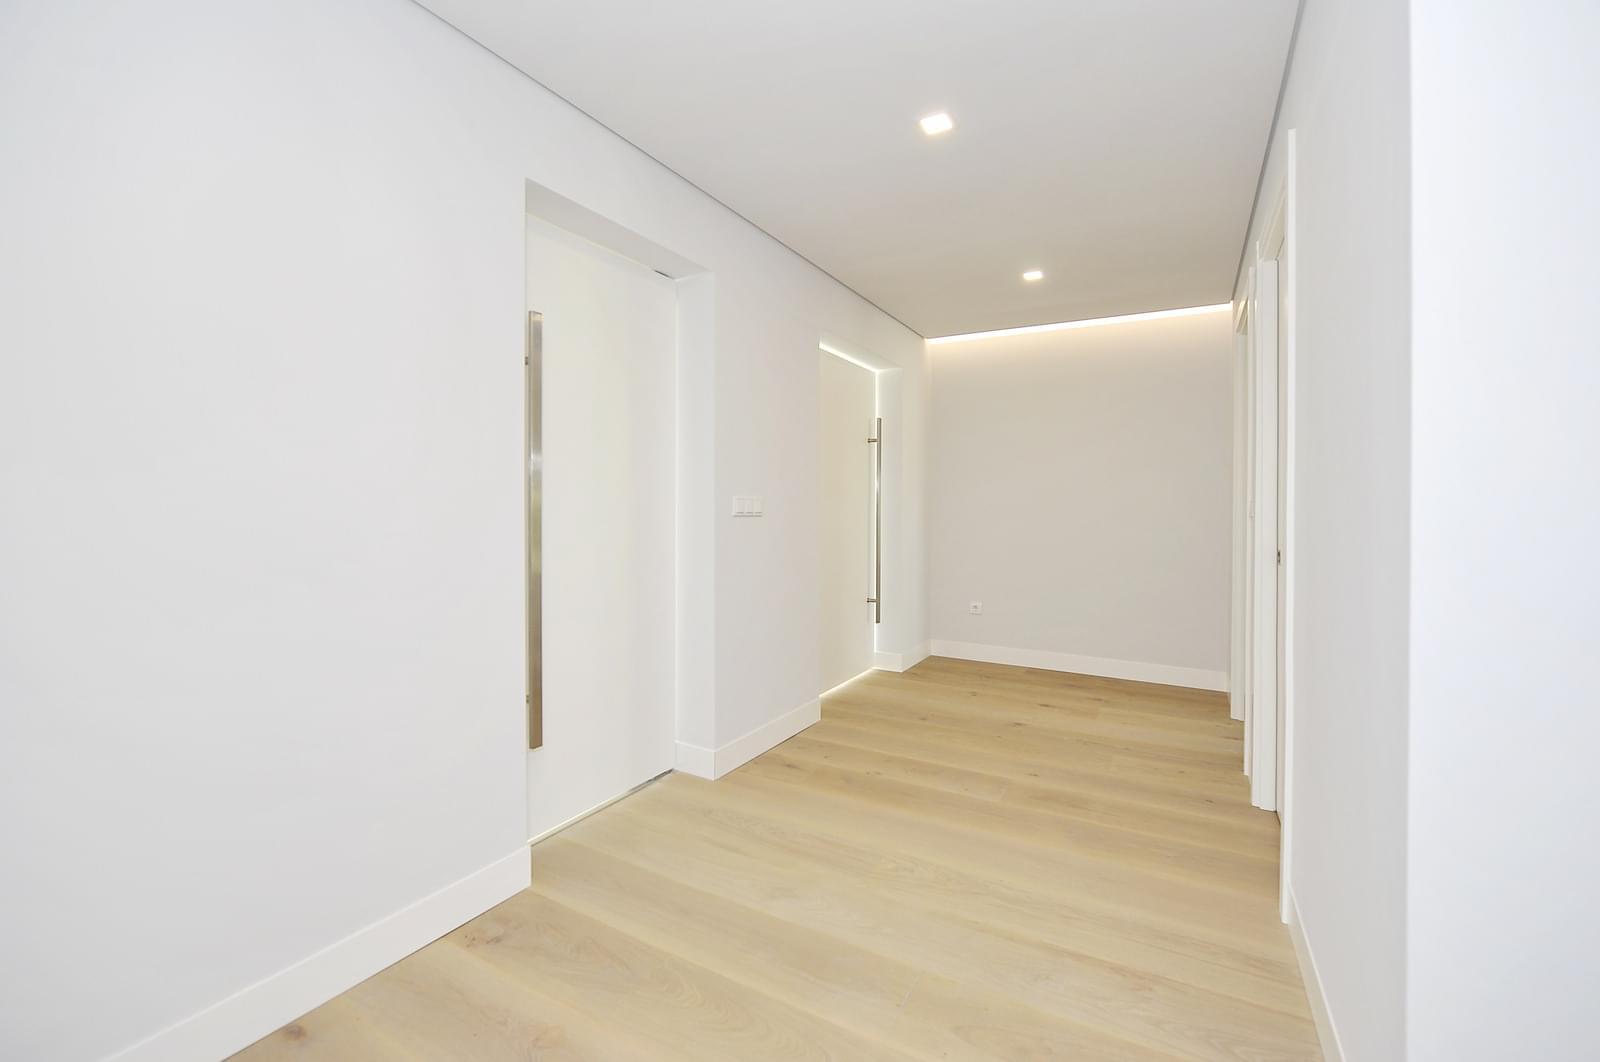 pf18989-apartamento-t4-oeiras-5af4a76d-e8de-4e4f-a2a9-4aa0730c429c